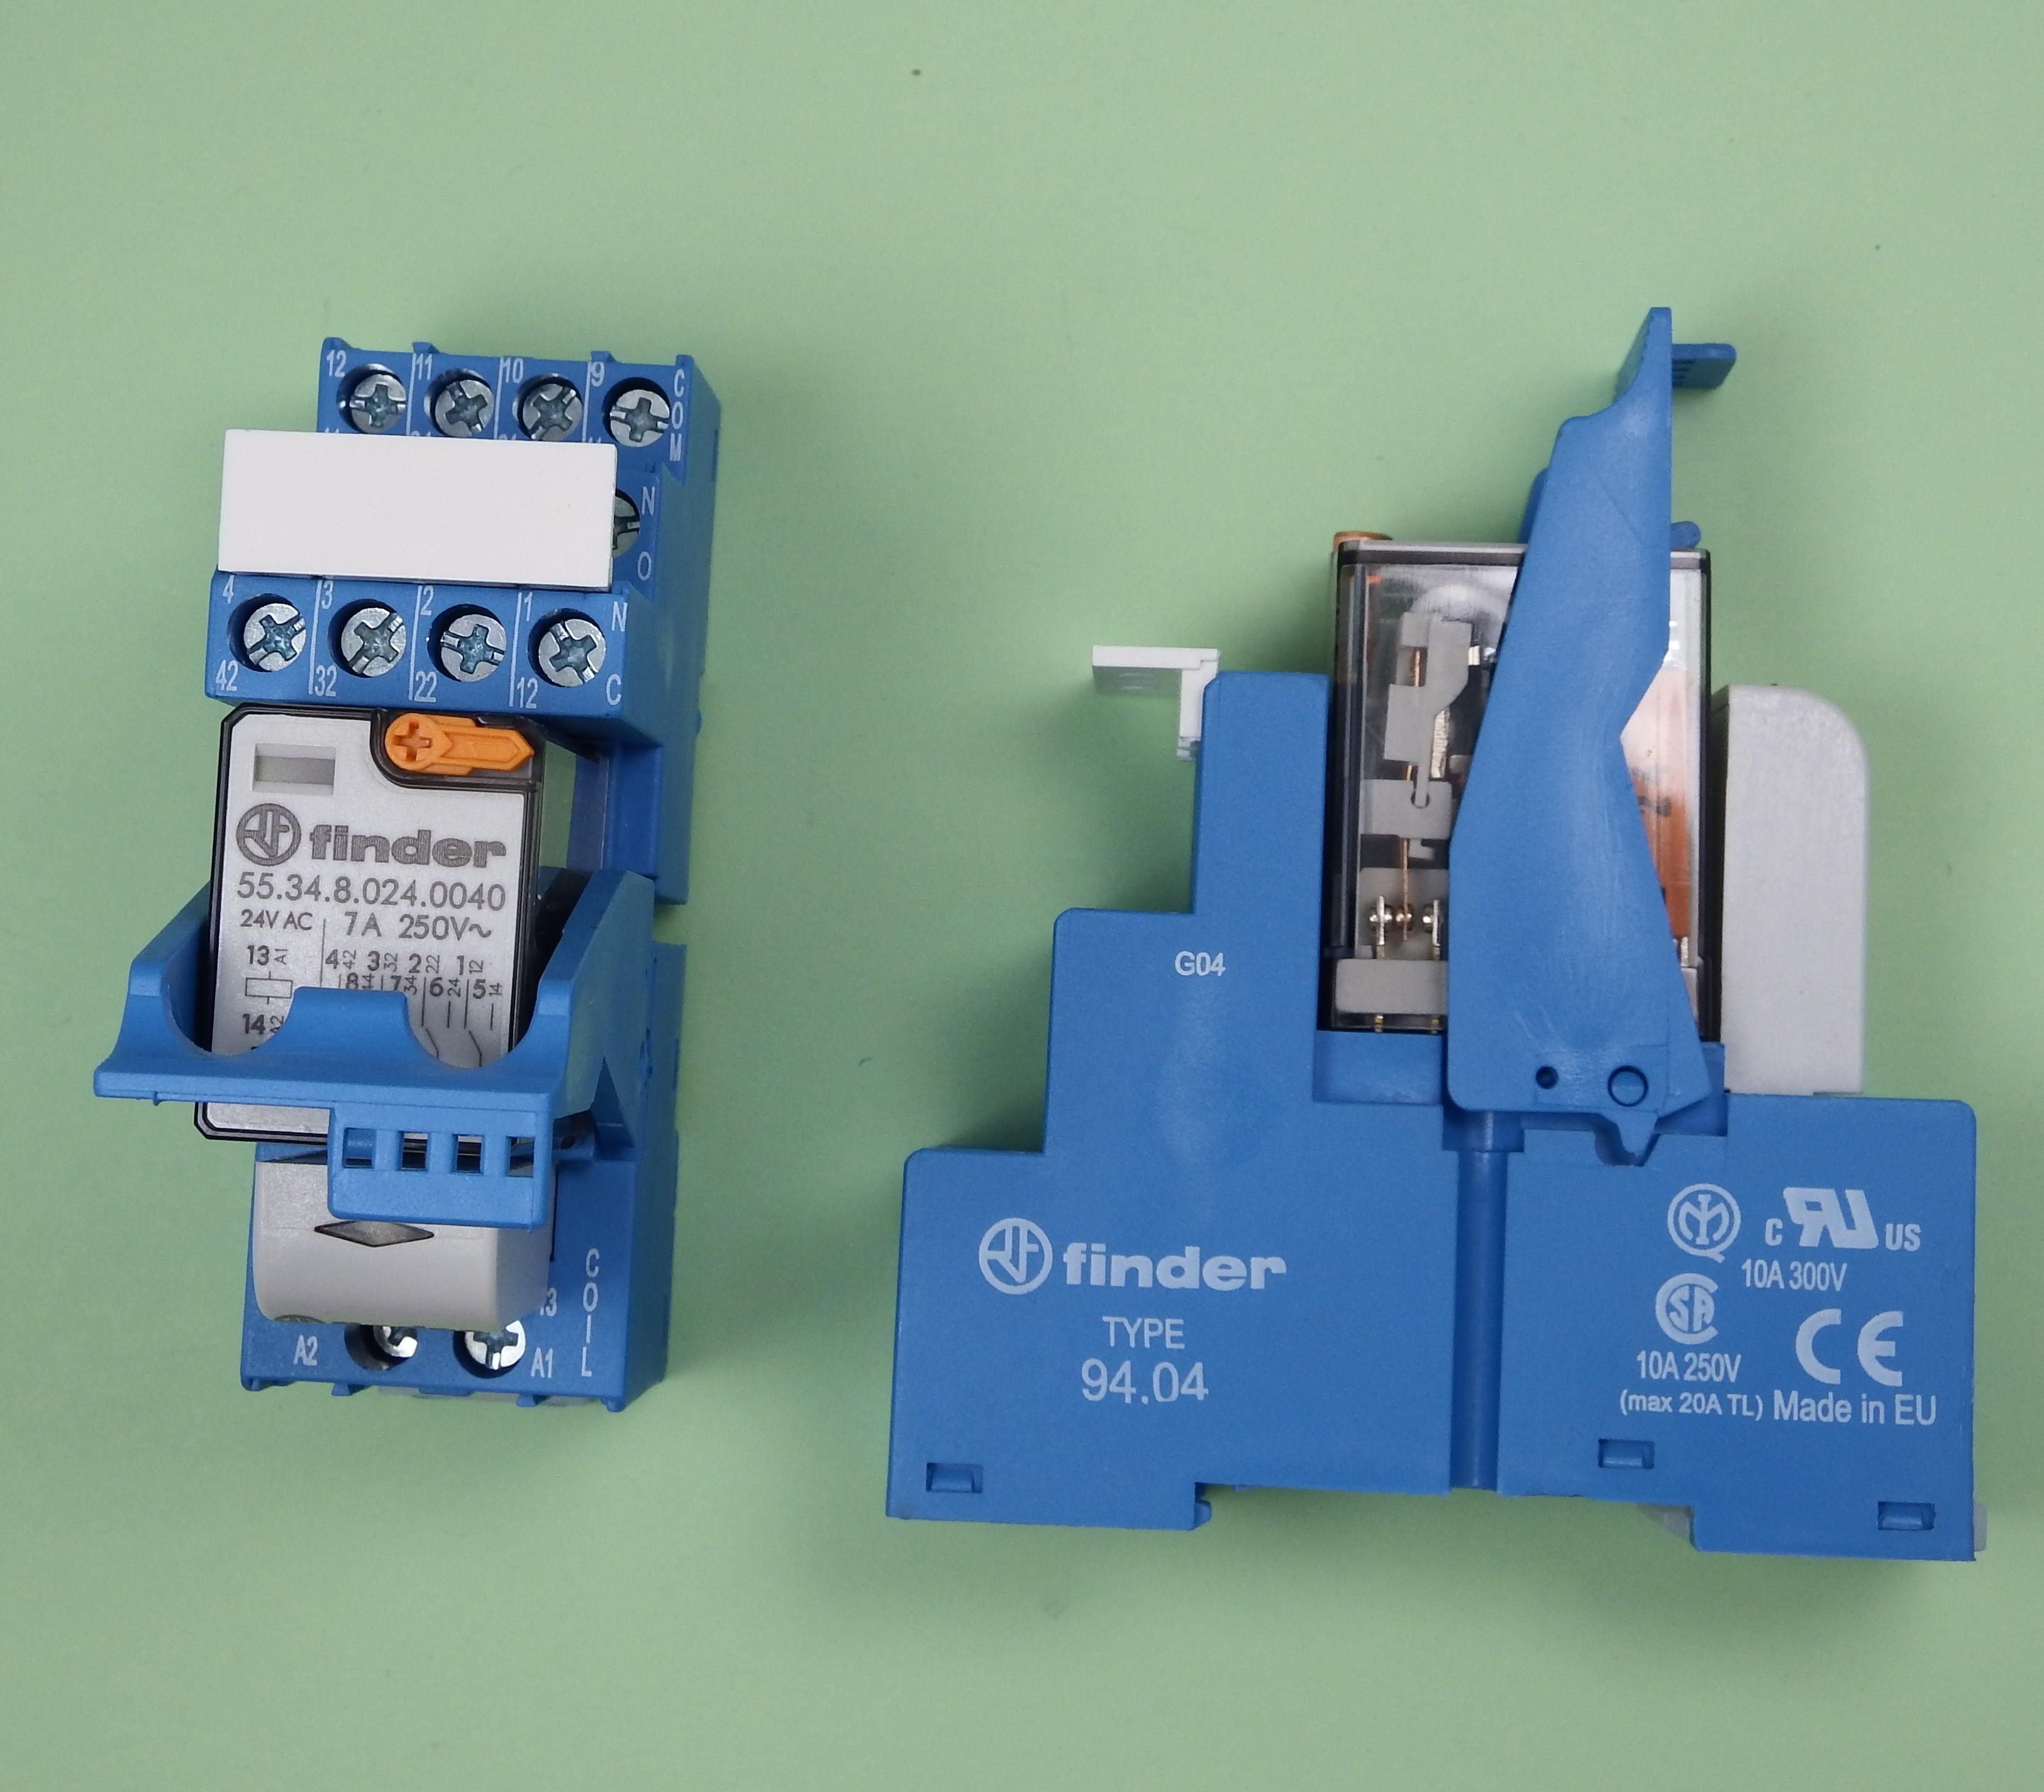 Finder Industrie Koppel Relais 24V AC 4 Wechsler 7A 58.34.8.024.0060 K